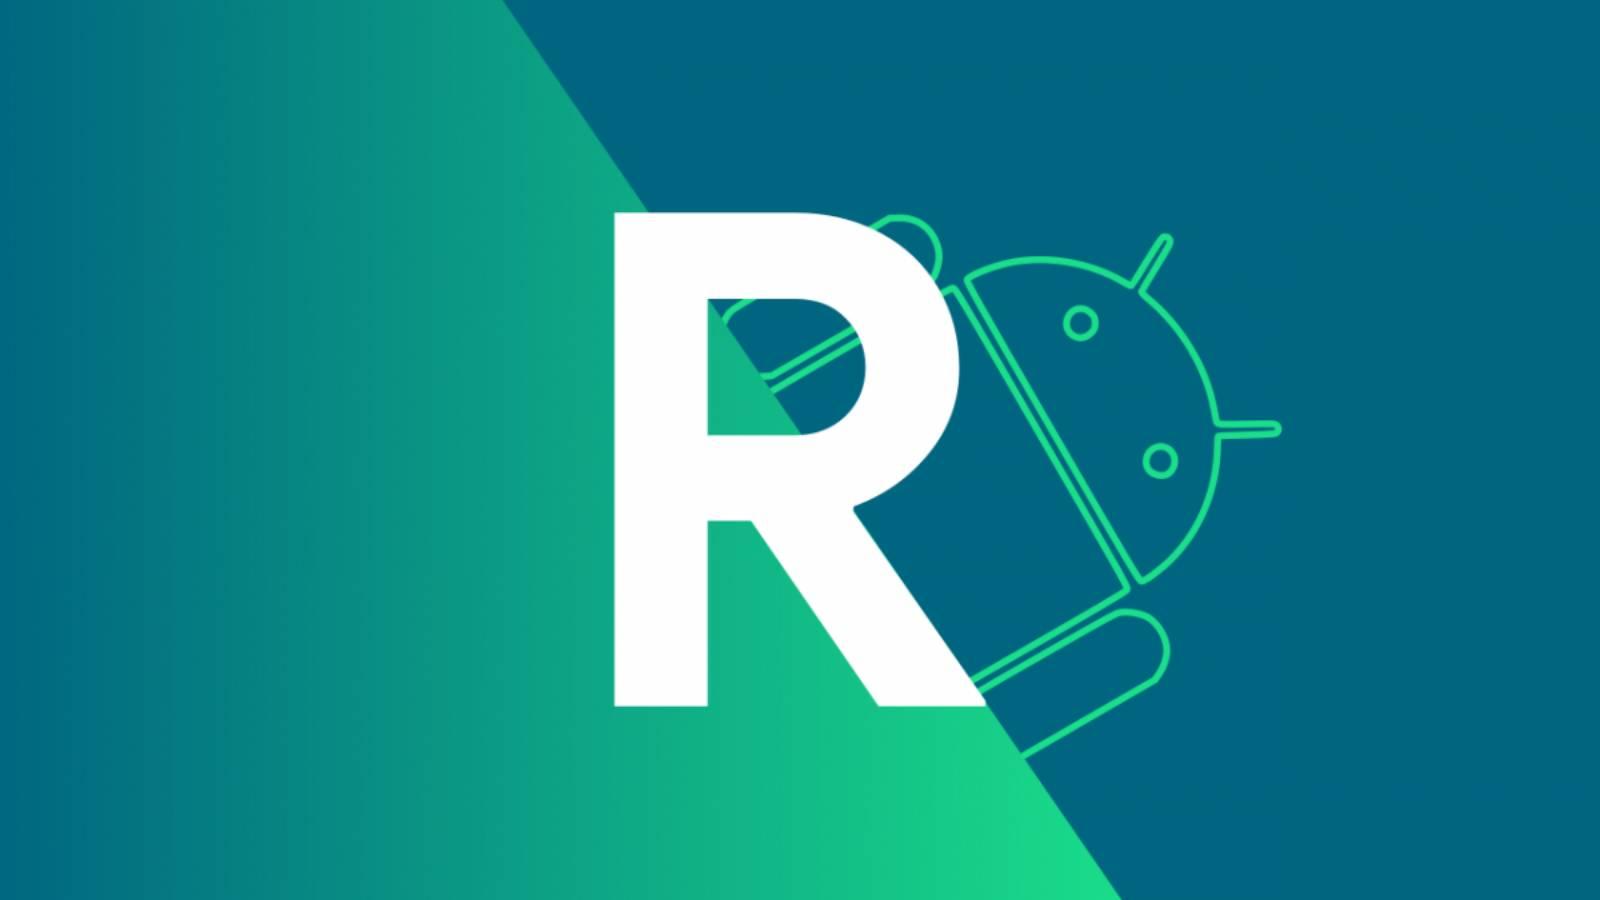 Android R capturi